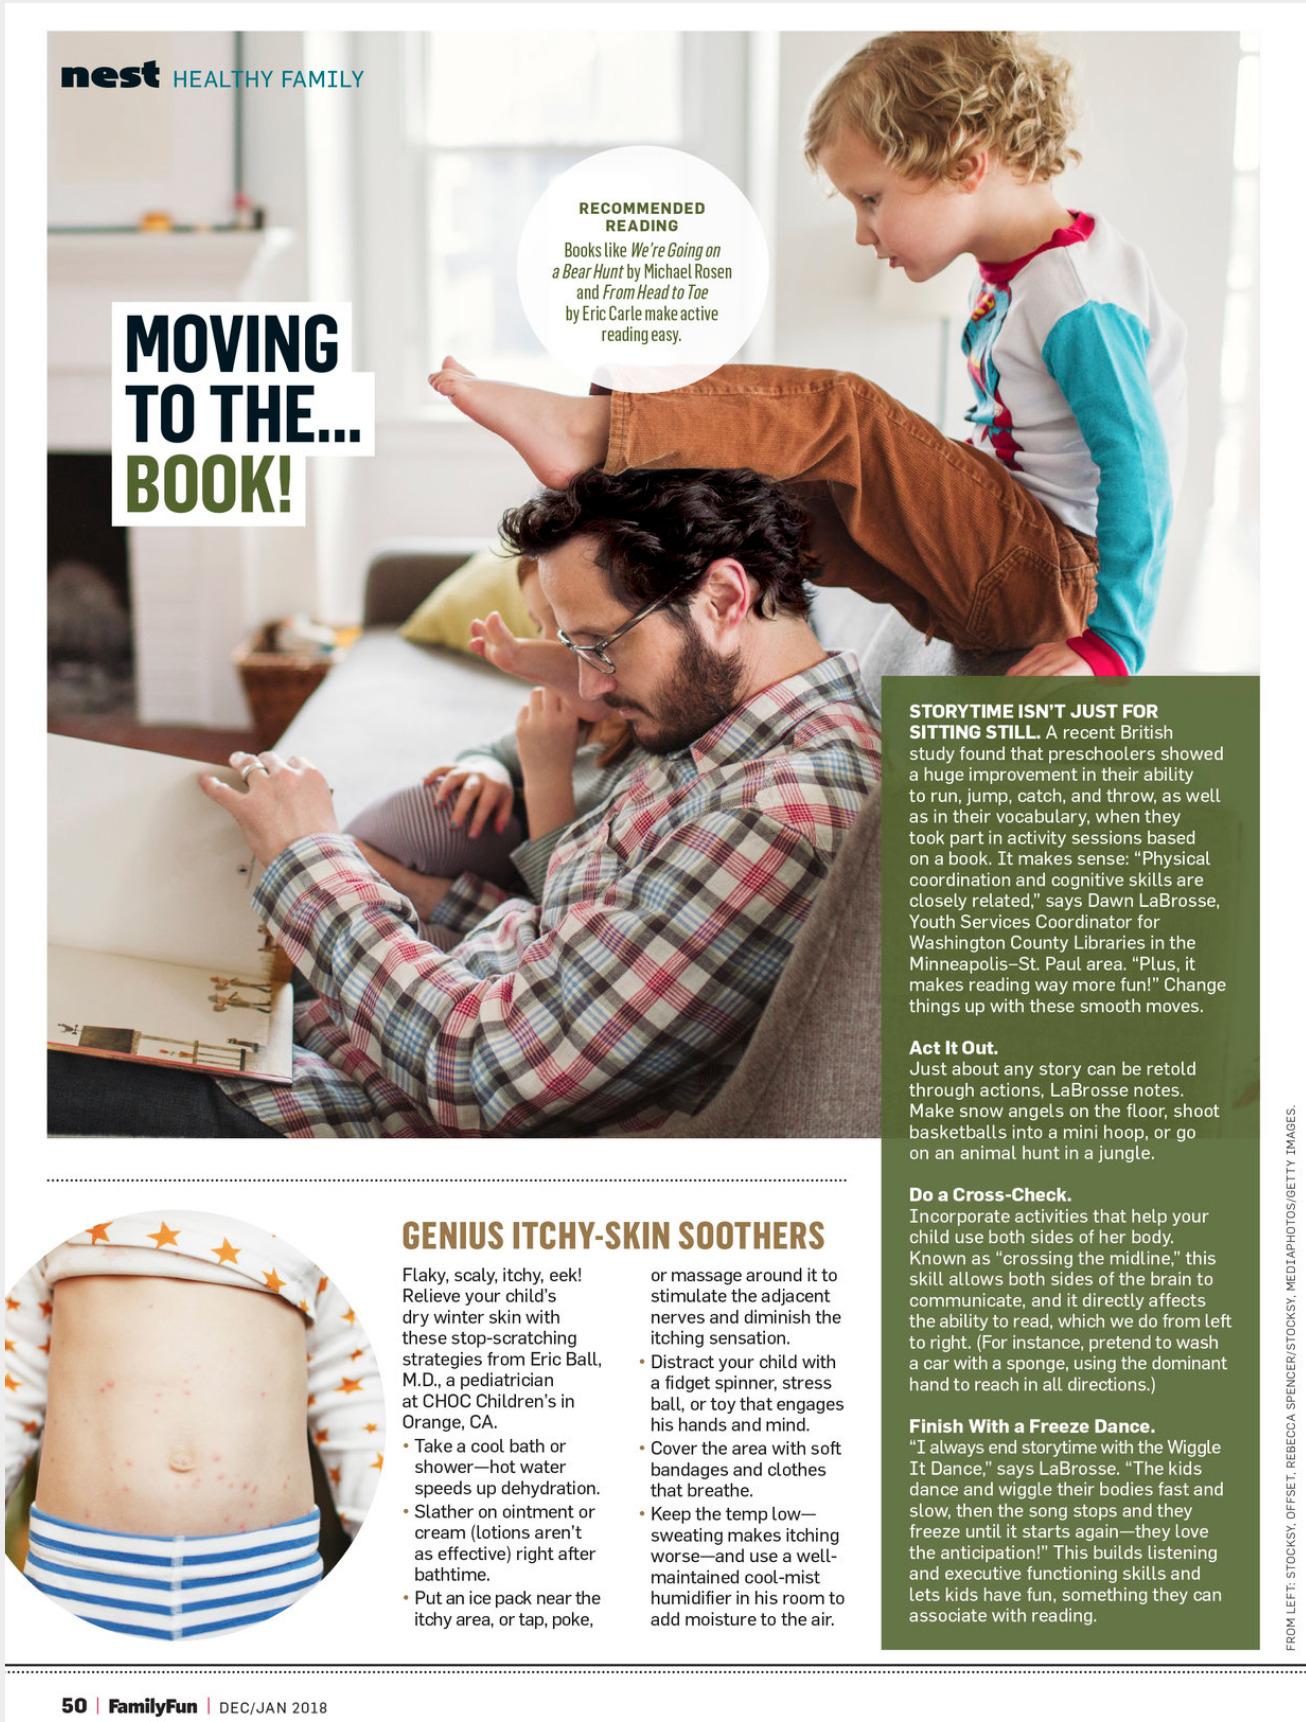 Screenshot-2018-5-7 FamilyFun Magazine.jpg